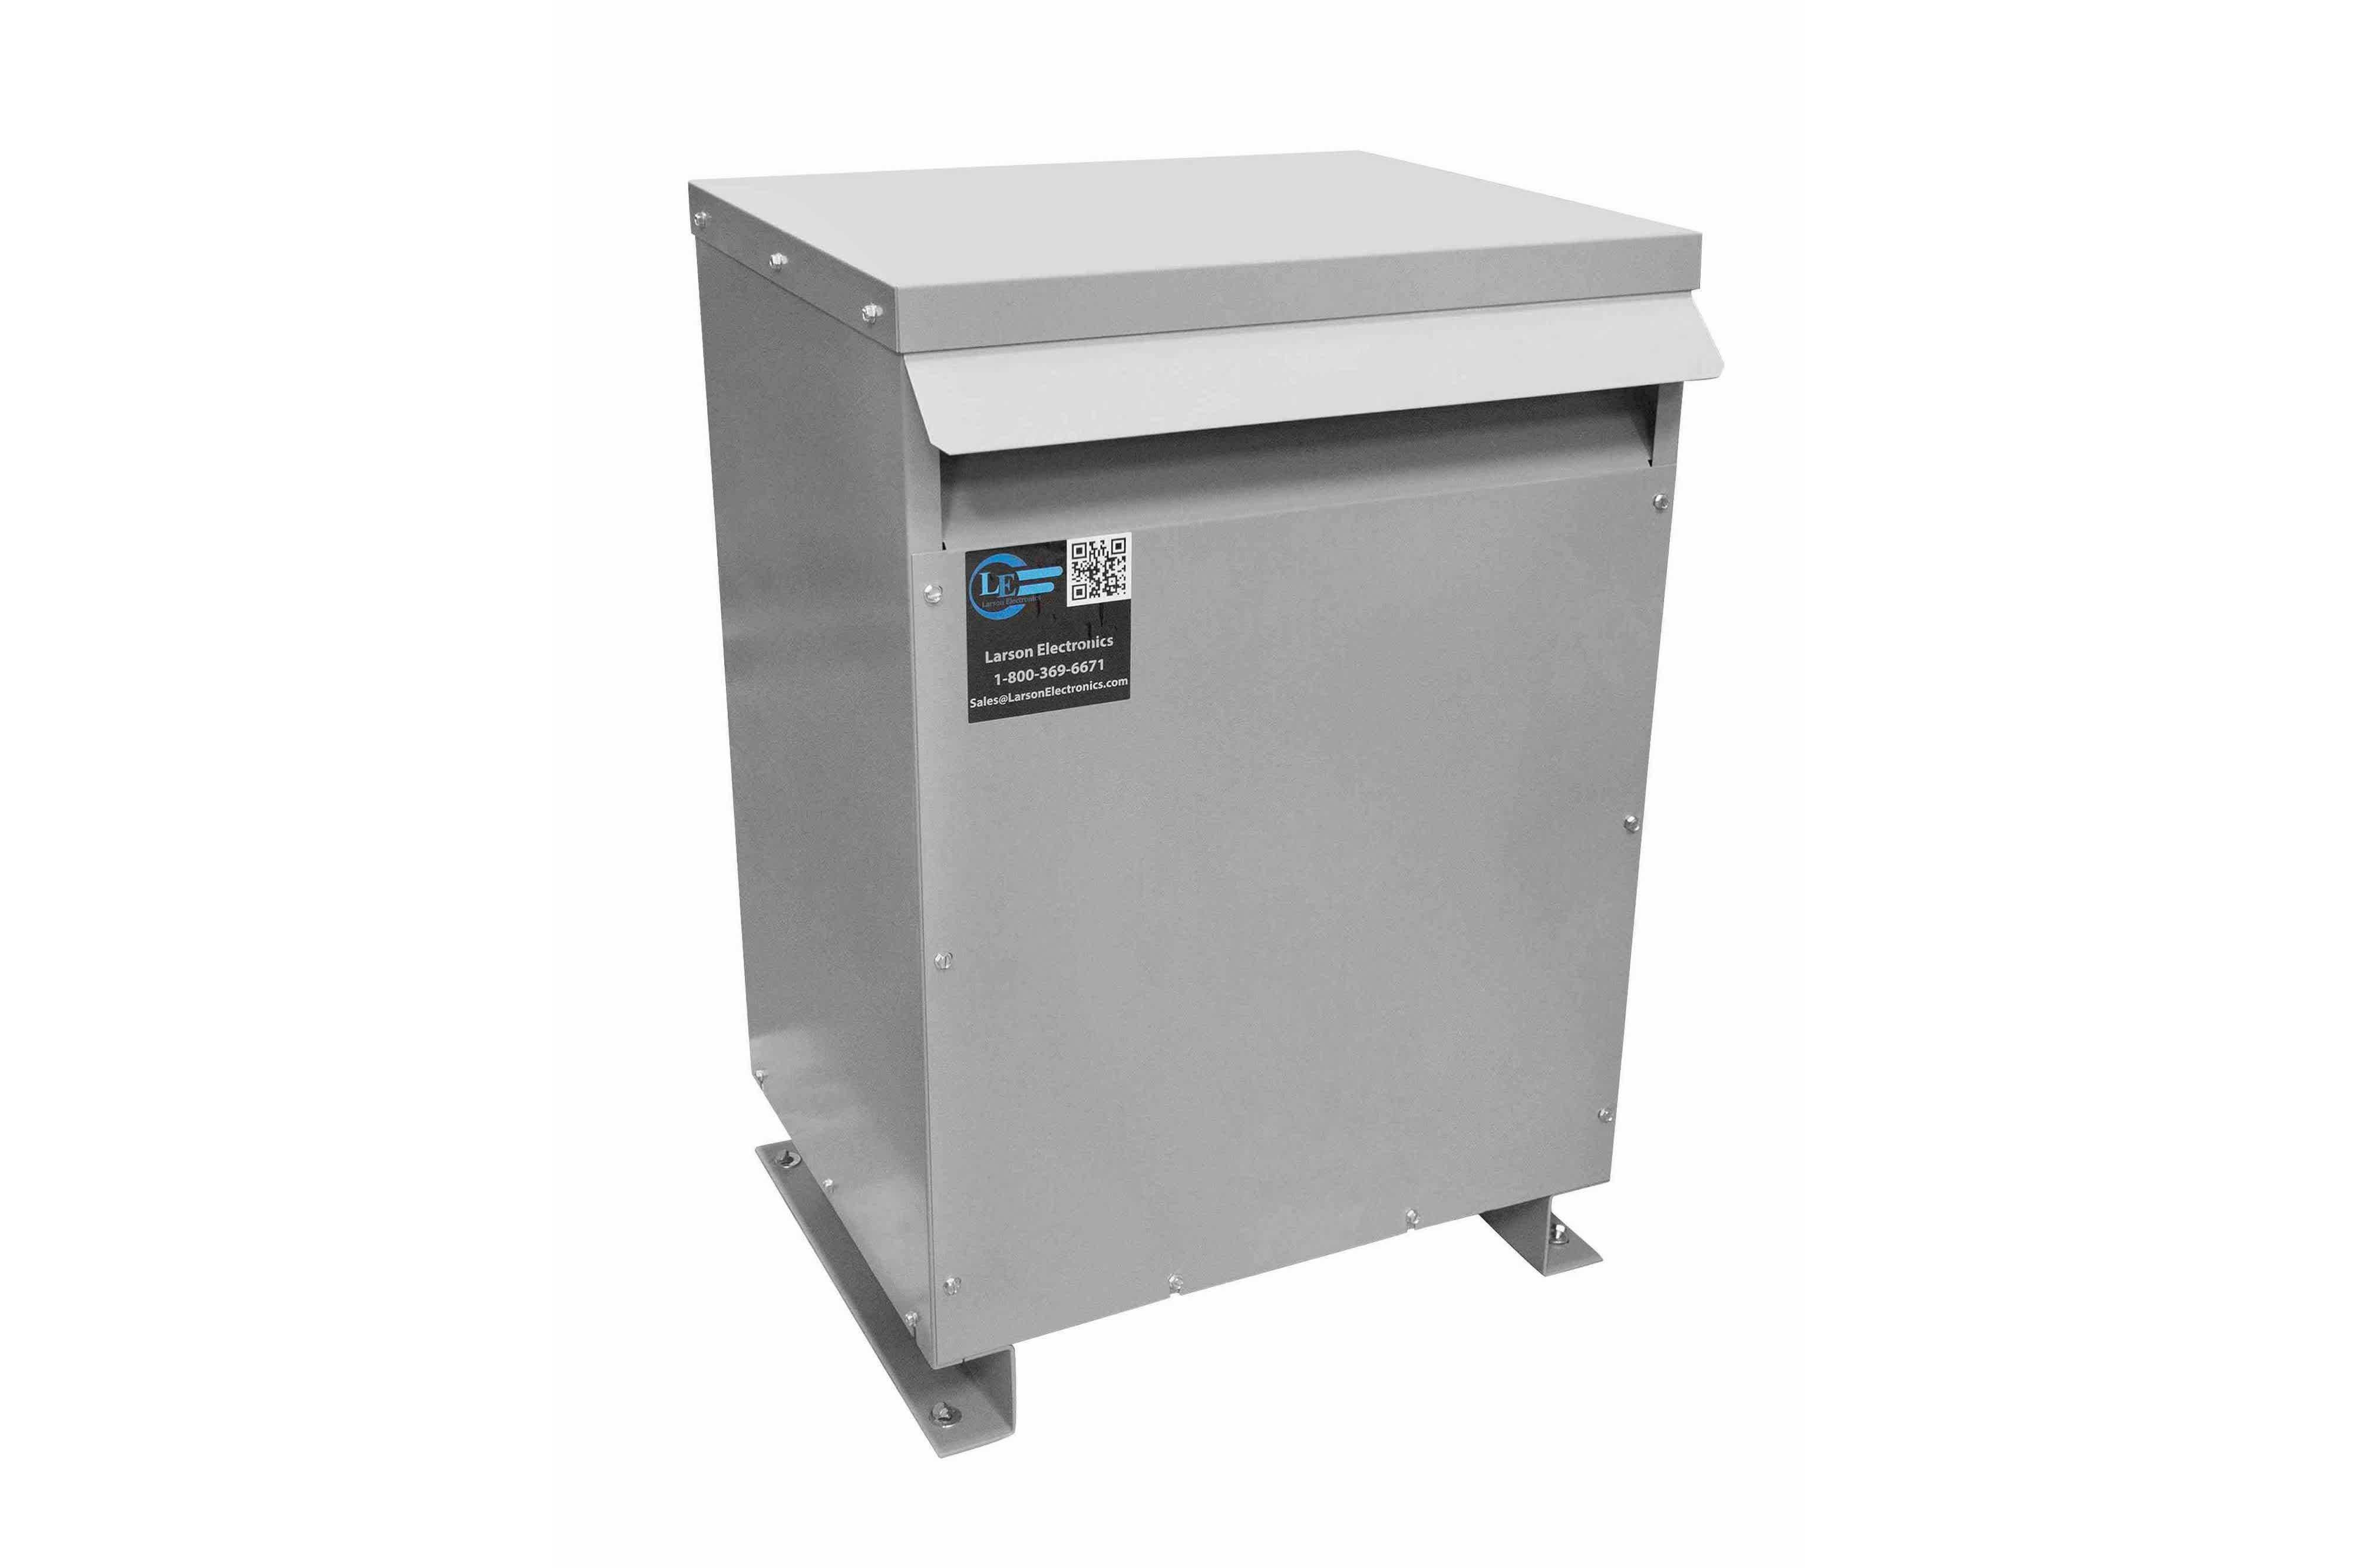 12 kVA 3PH Isolation Transformer, 600V Wye Primary, 208Y/120 Wye-N Secondary, N3R, Ventilated, 60 Hz